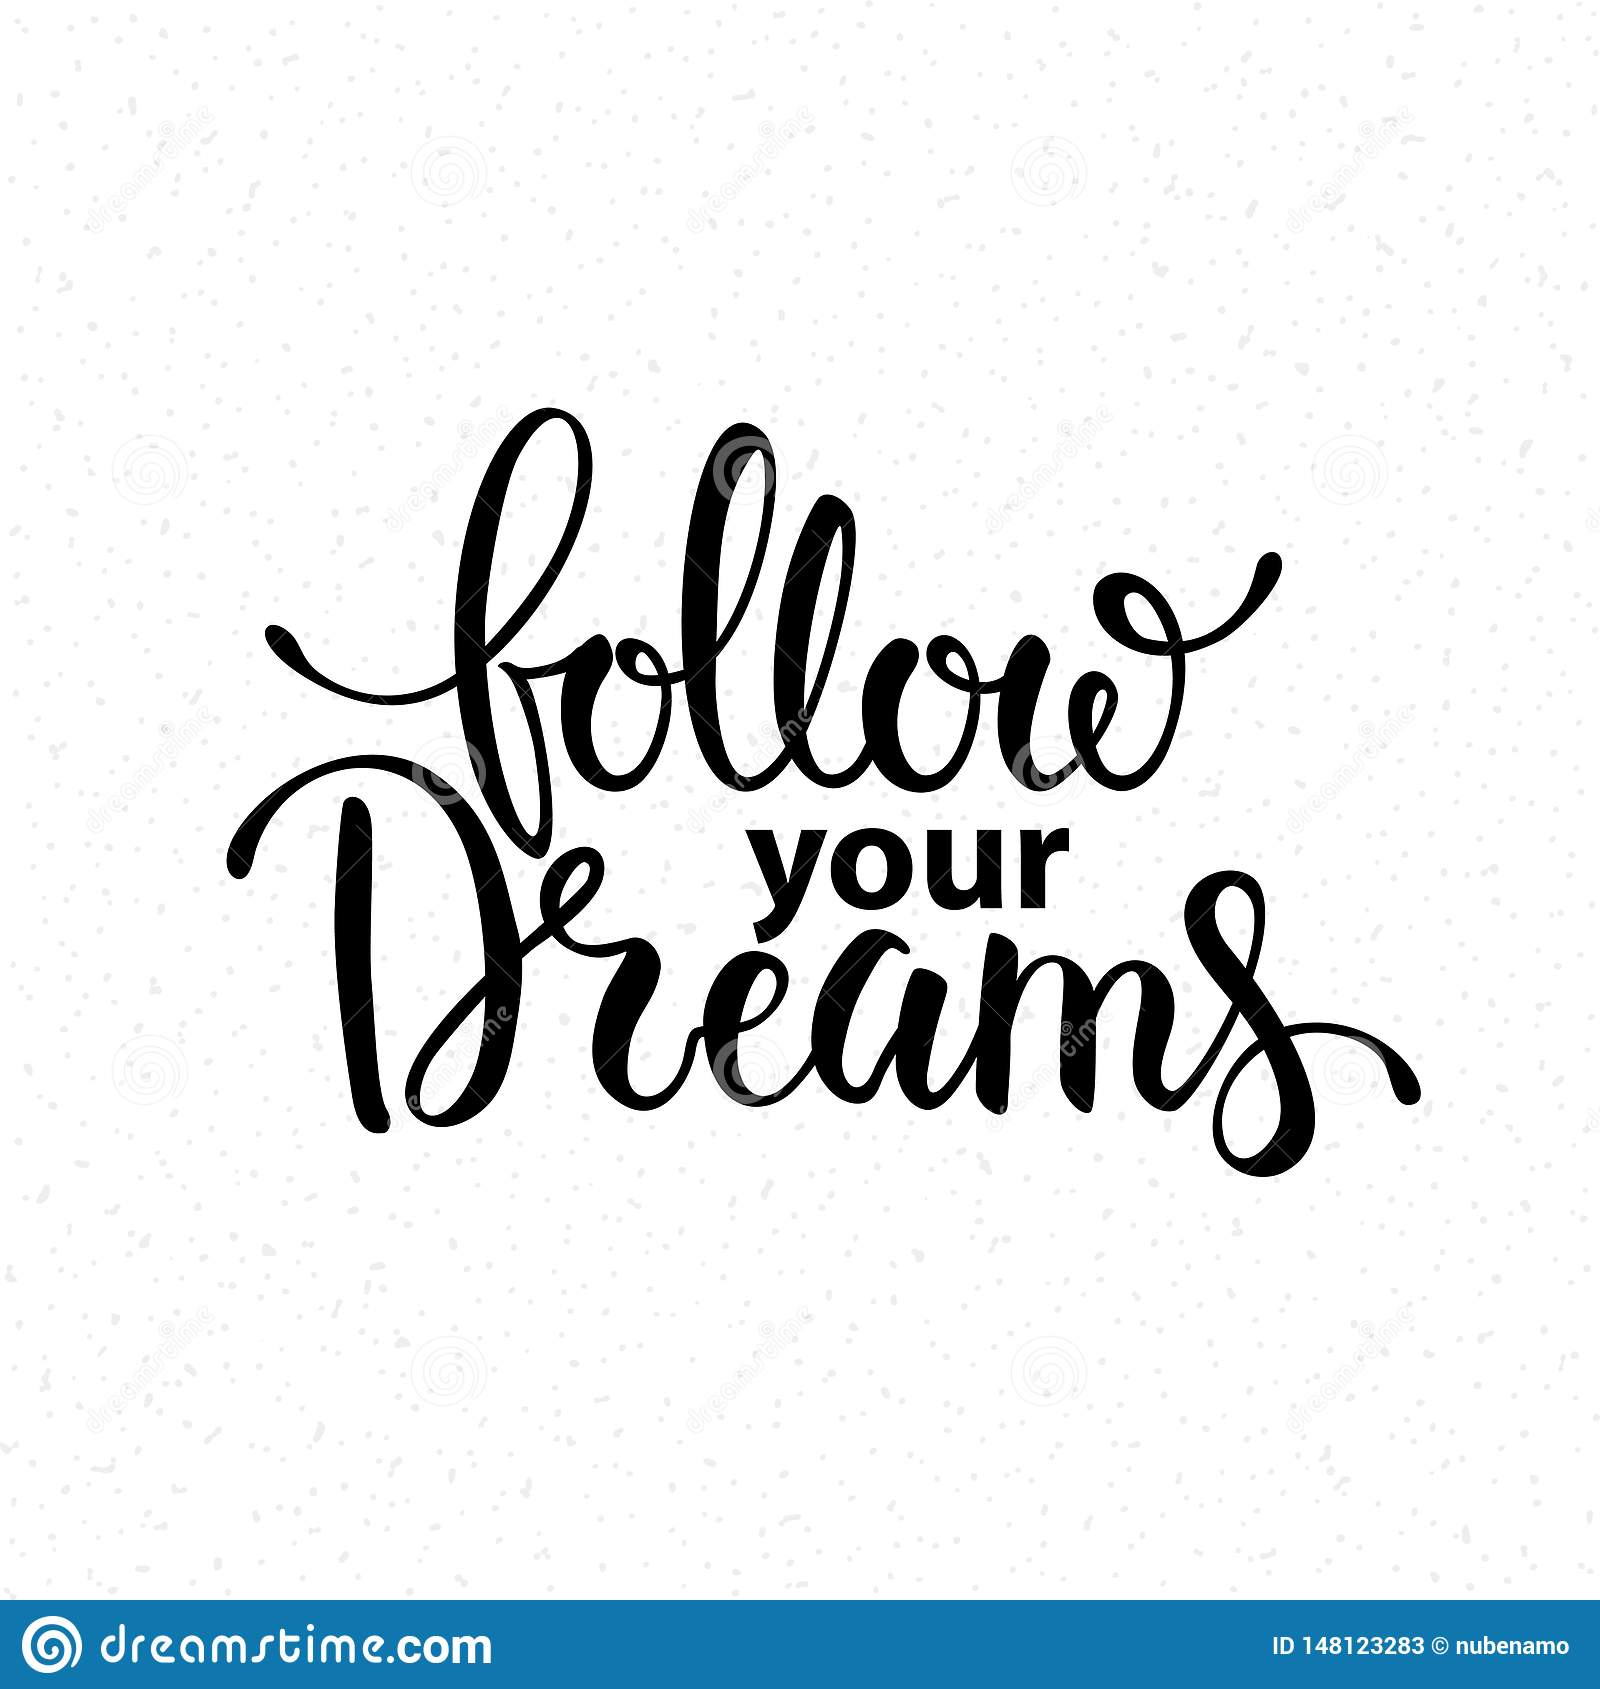 Follow Your Dreams Handwritten Lettering Design. Motivational Phrase.